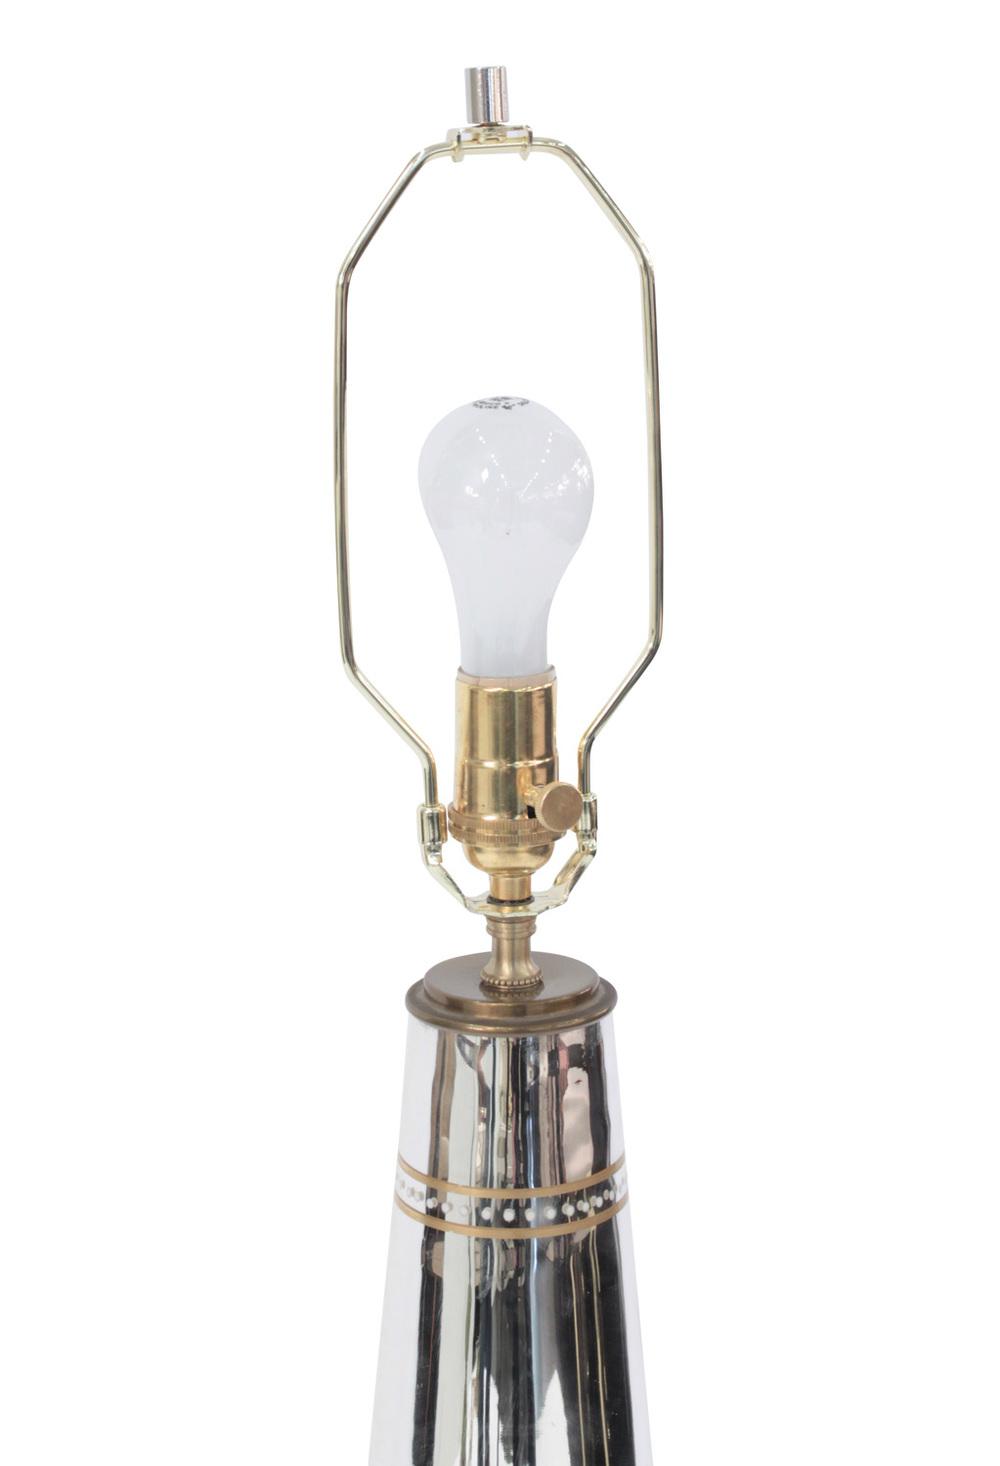 40s 75 lrg mercury+gold&white dec tablelamps292 detail1 hires.jpg